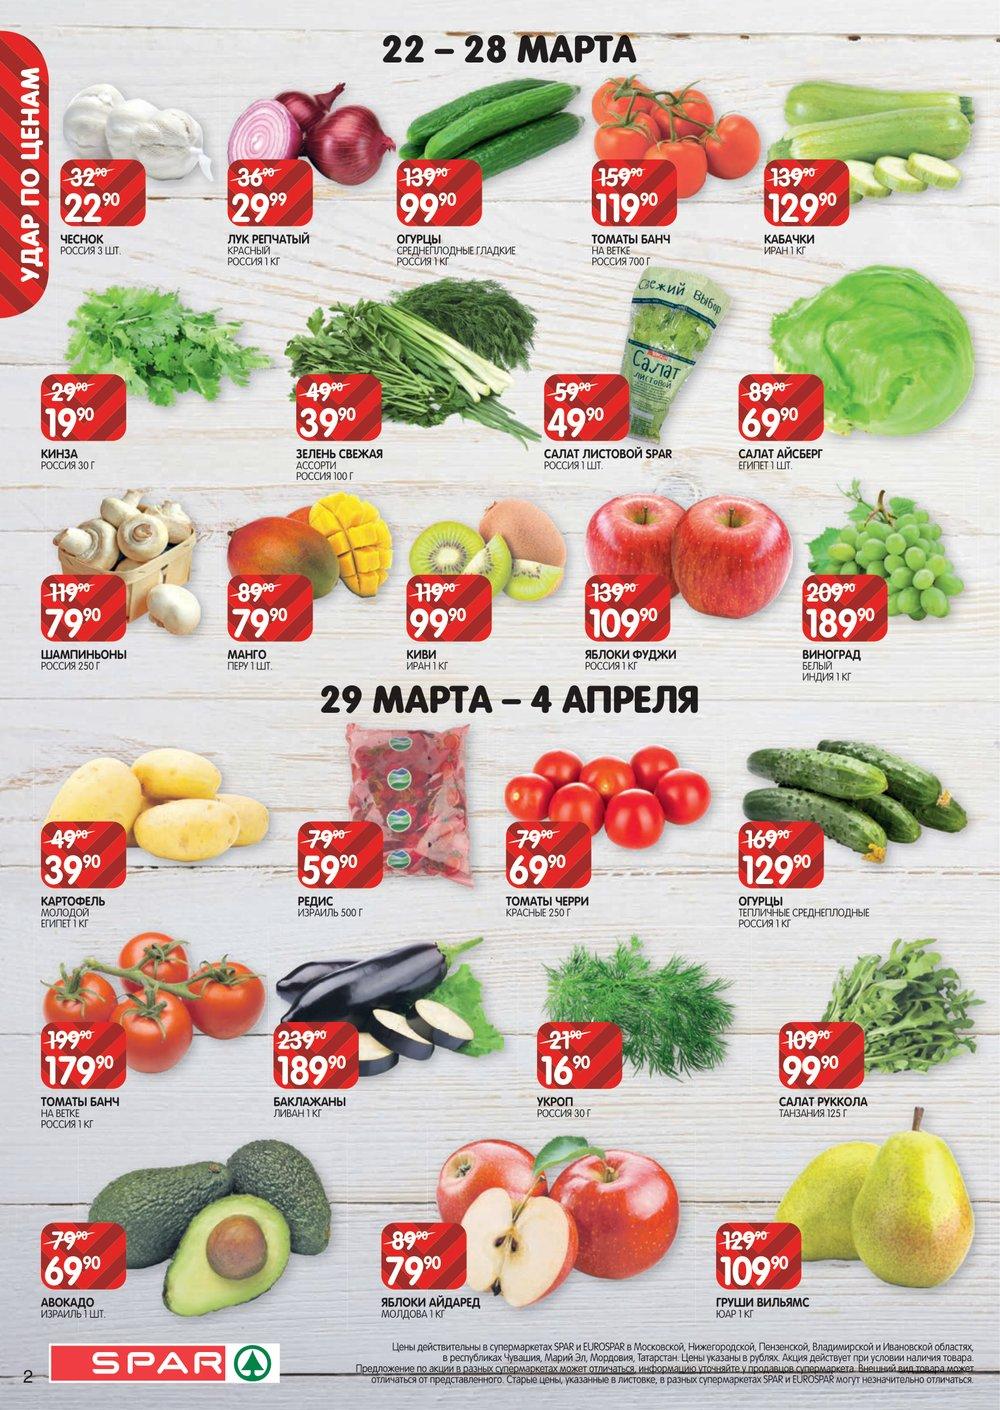 Каталог акций Spar с 22 марта по 4 апреля 2018 - стр. 2